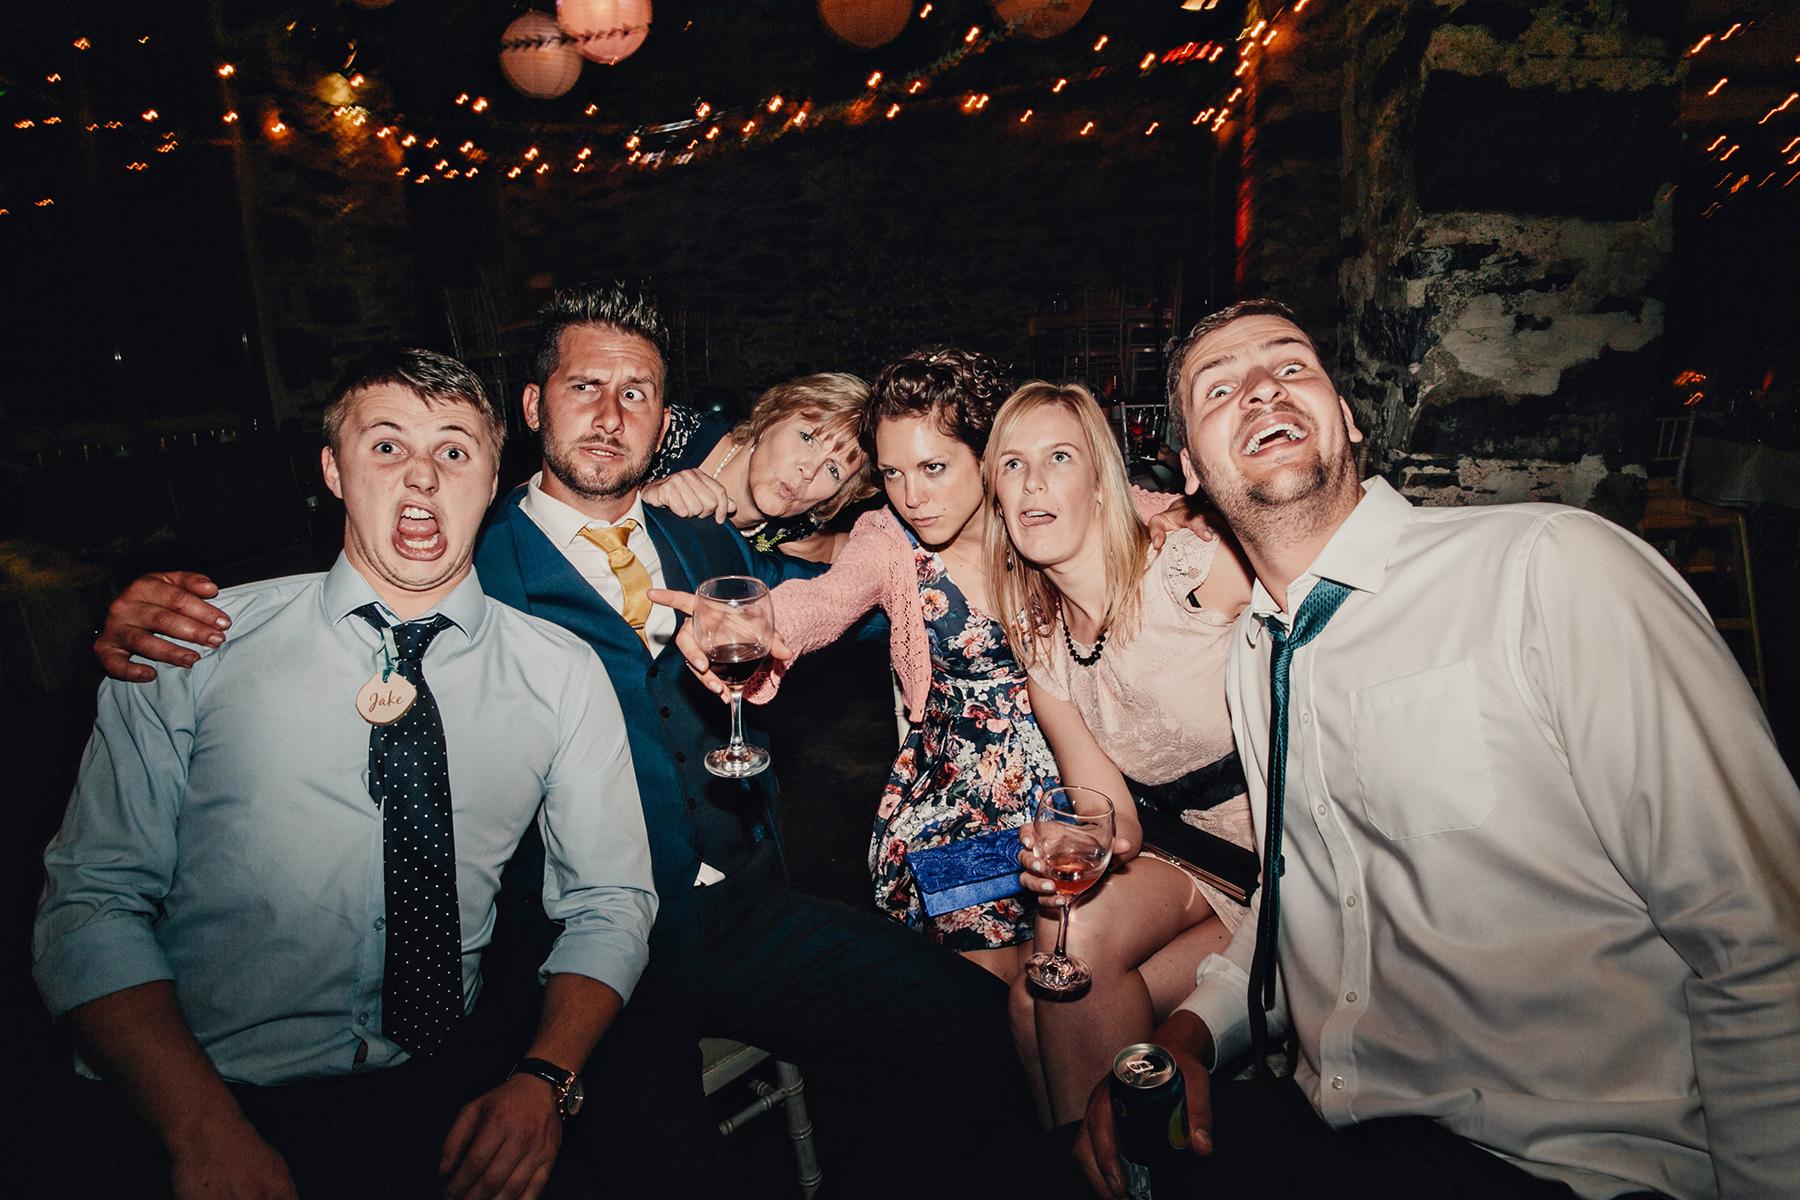 Snowdonia-Wales-Wedding-Photos-0415.jpg